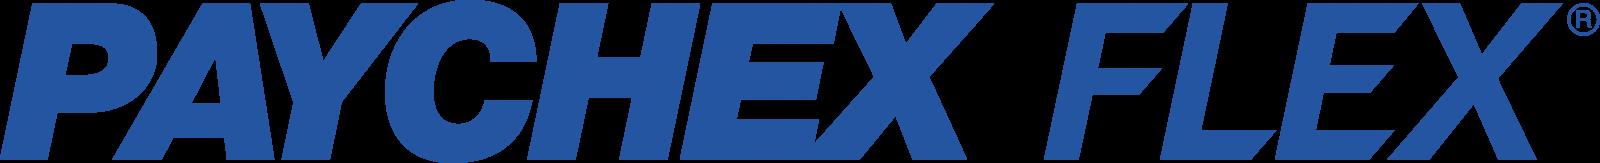 Paycheck Flex Official site login